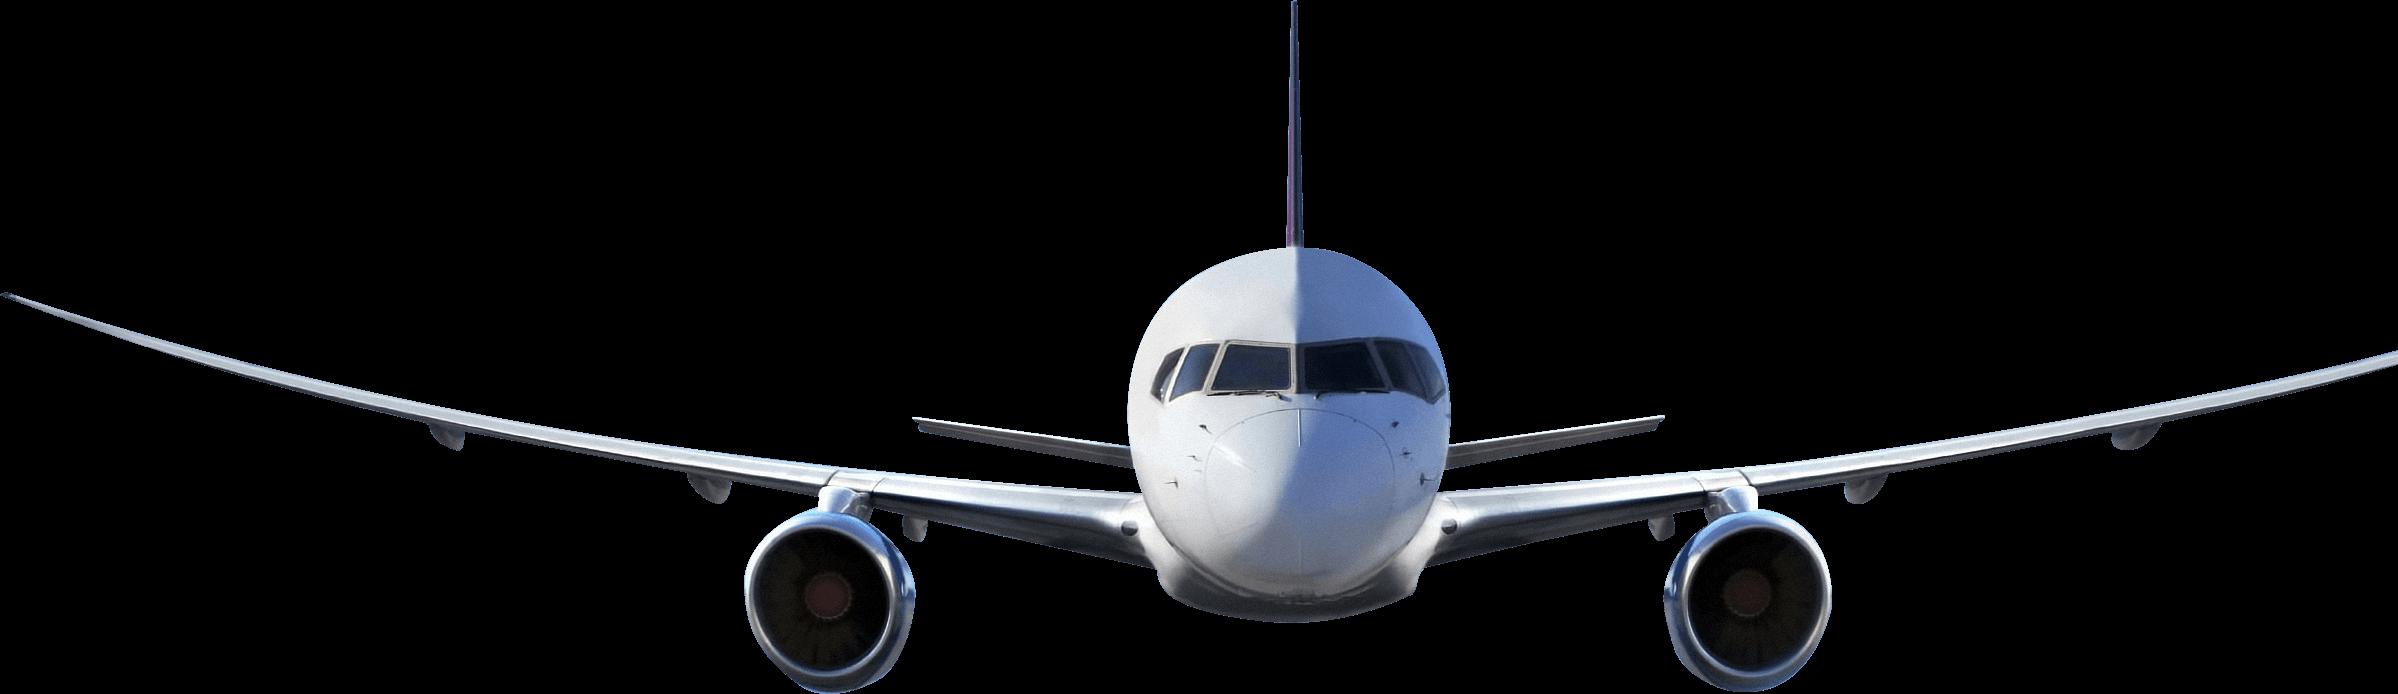 plane front transparent png stickpng